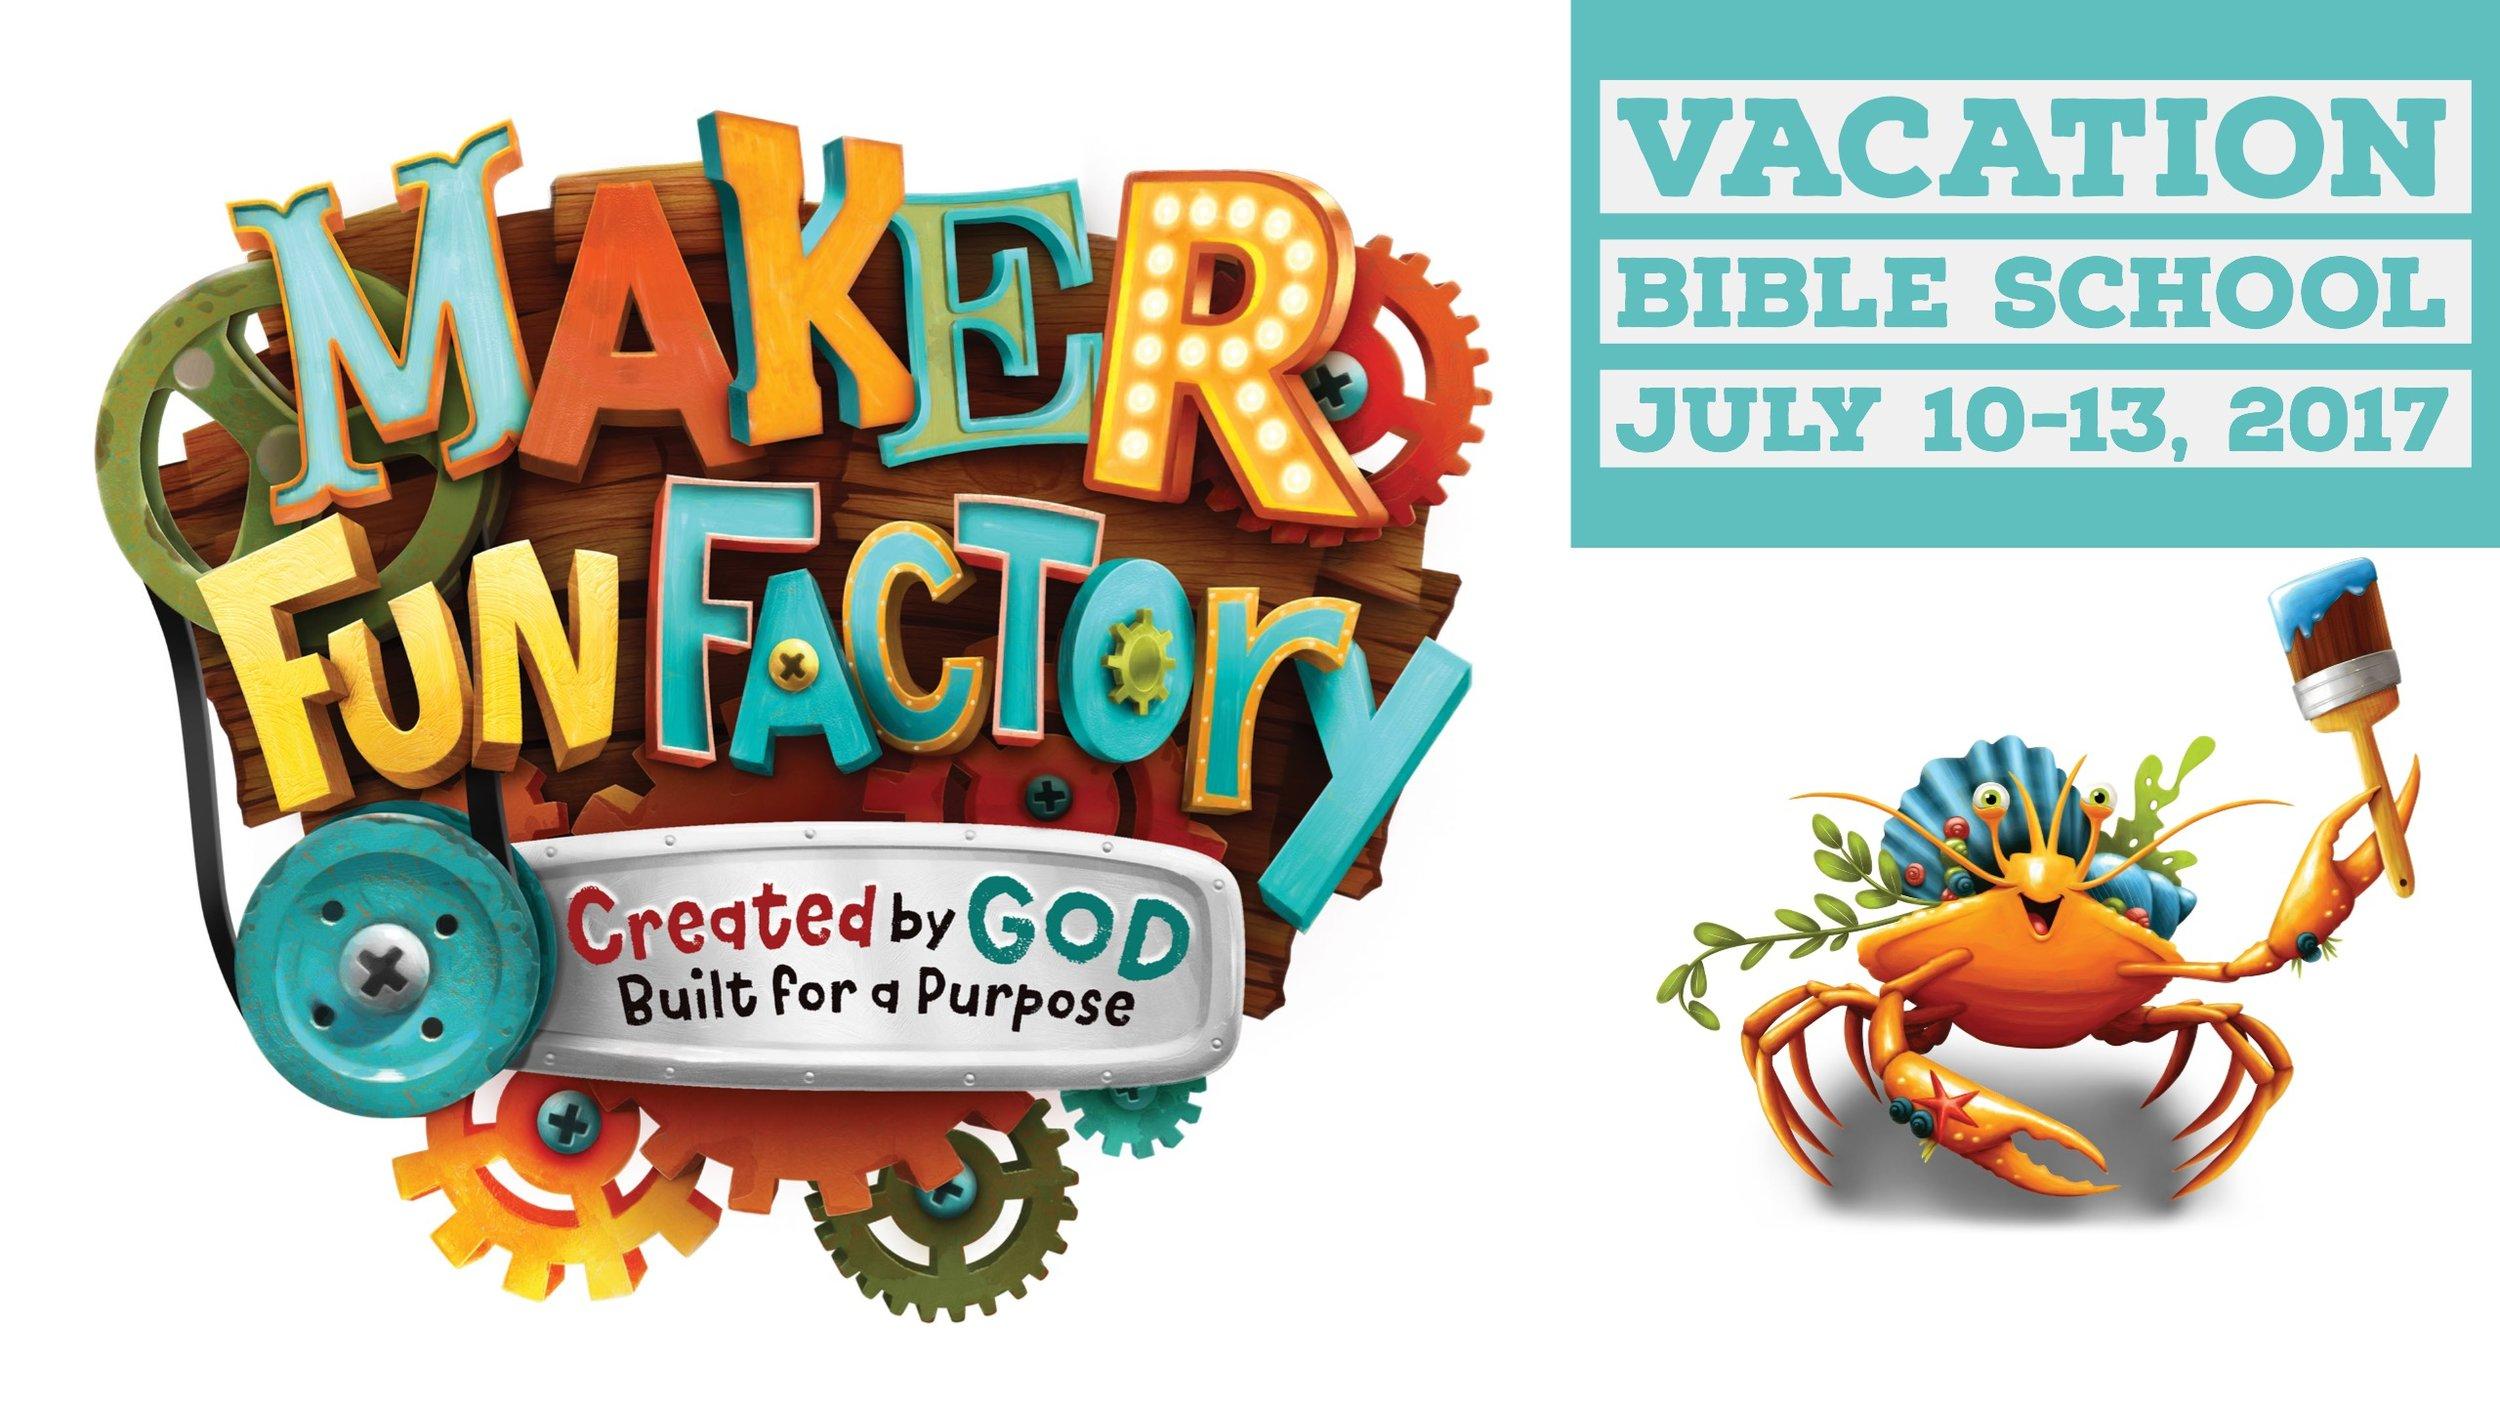 Fun maker vbs clipart clip transparent library Vacation Bible School - Maker Fun Factory — Immaculate Conception ... clip transparent library